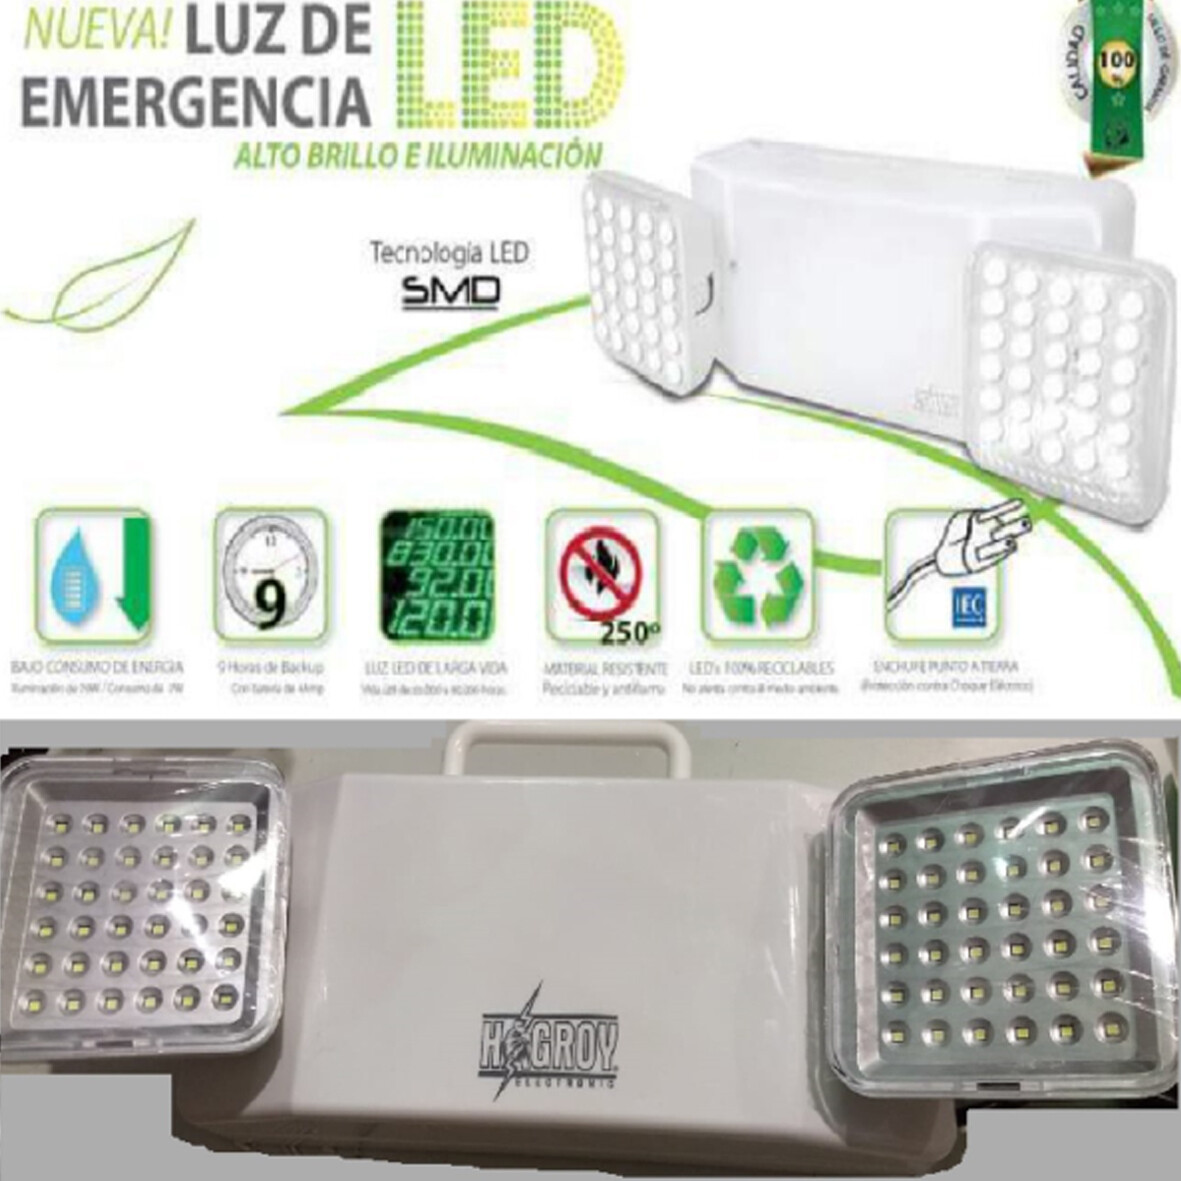 LUZ DE EMERGENCIA 72 LED 12H DURACION - HAGROY